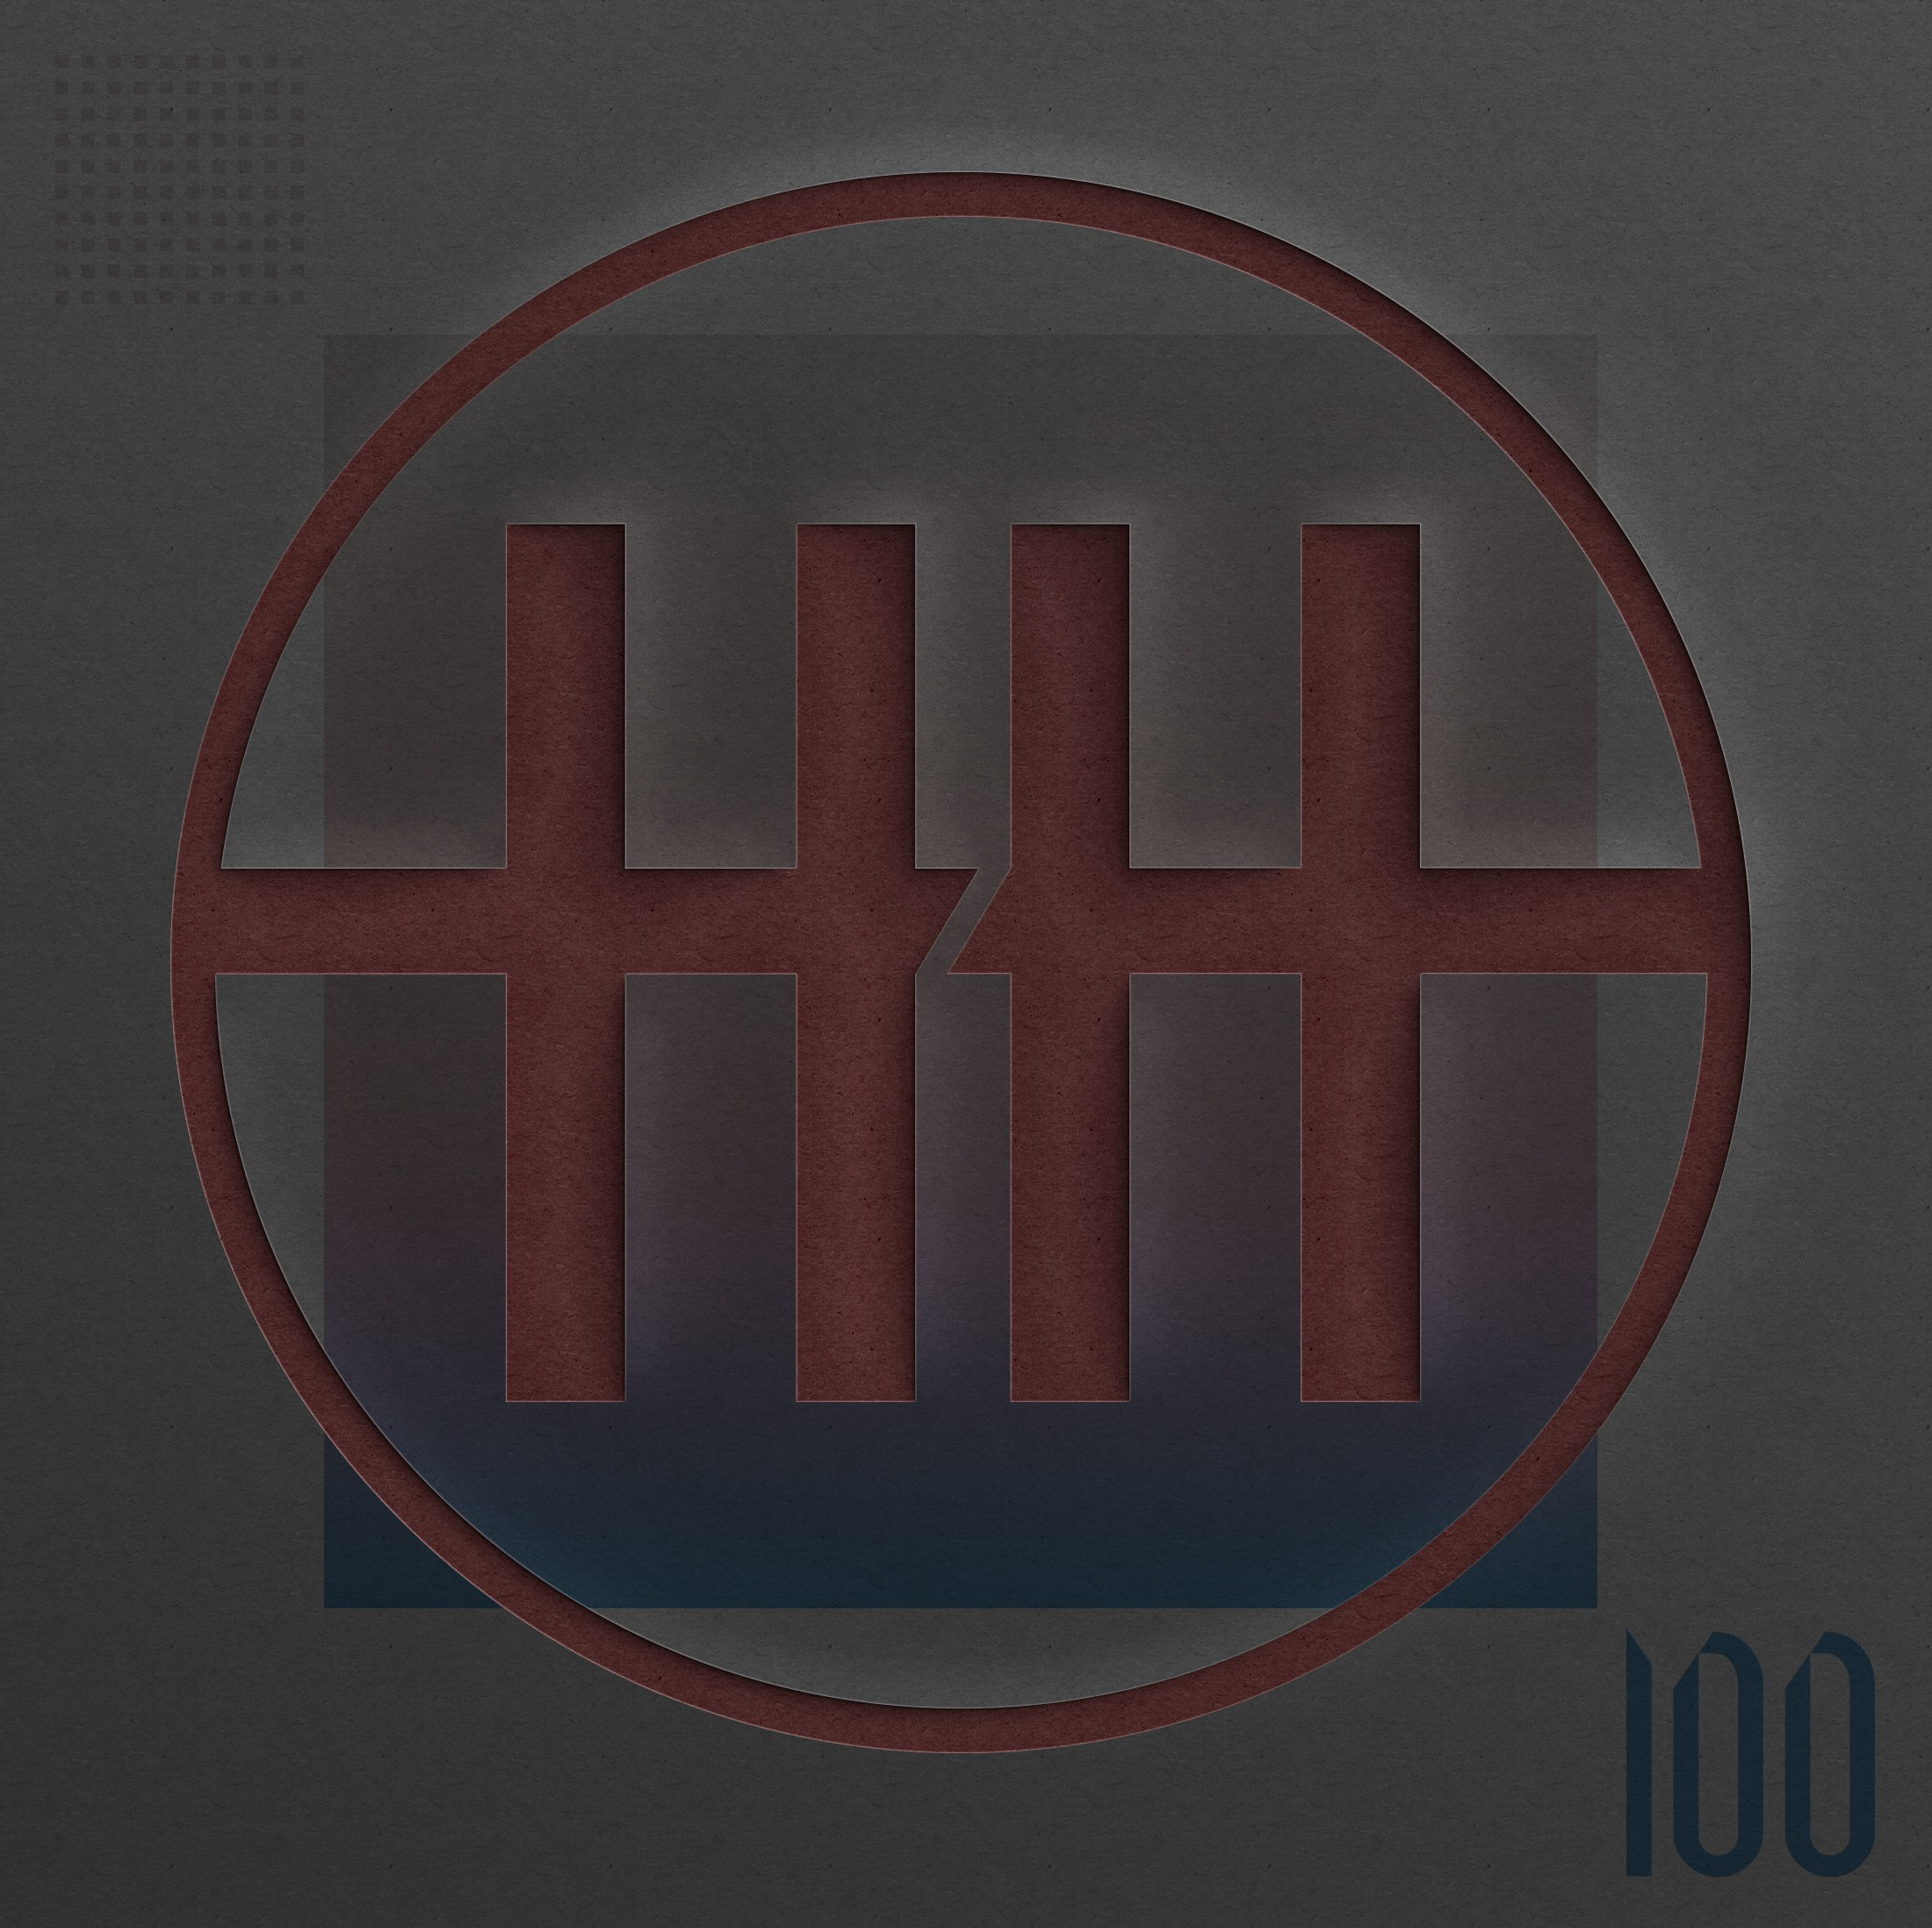 Hush Hush 100